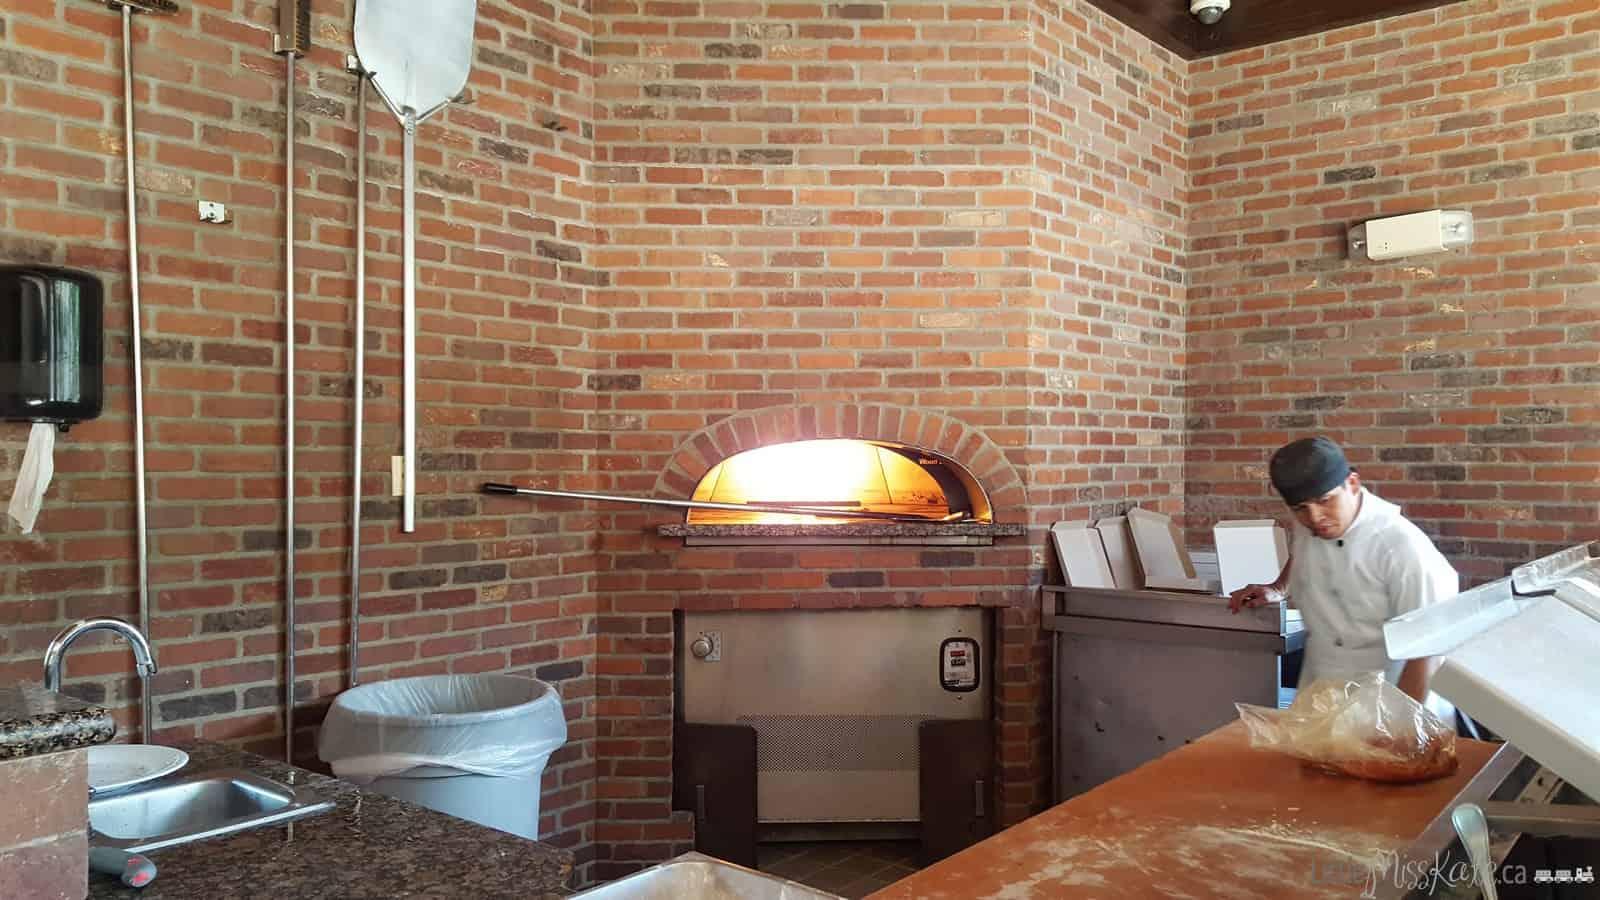 Beaches Resort Villages Turks and Caicos Restaurants - Dinos Pizzeria via littlemisskate.ca